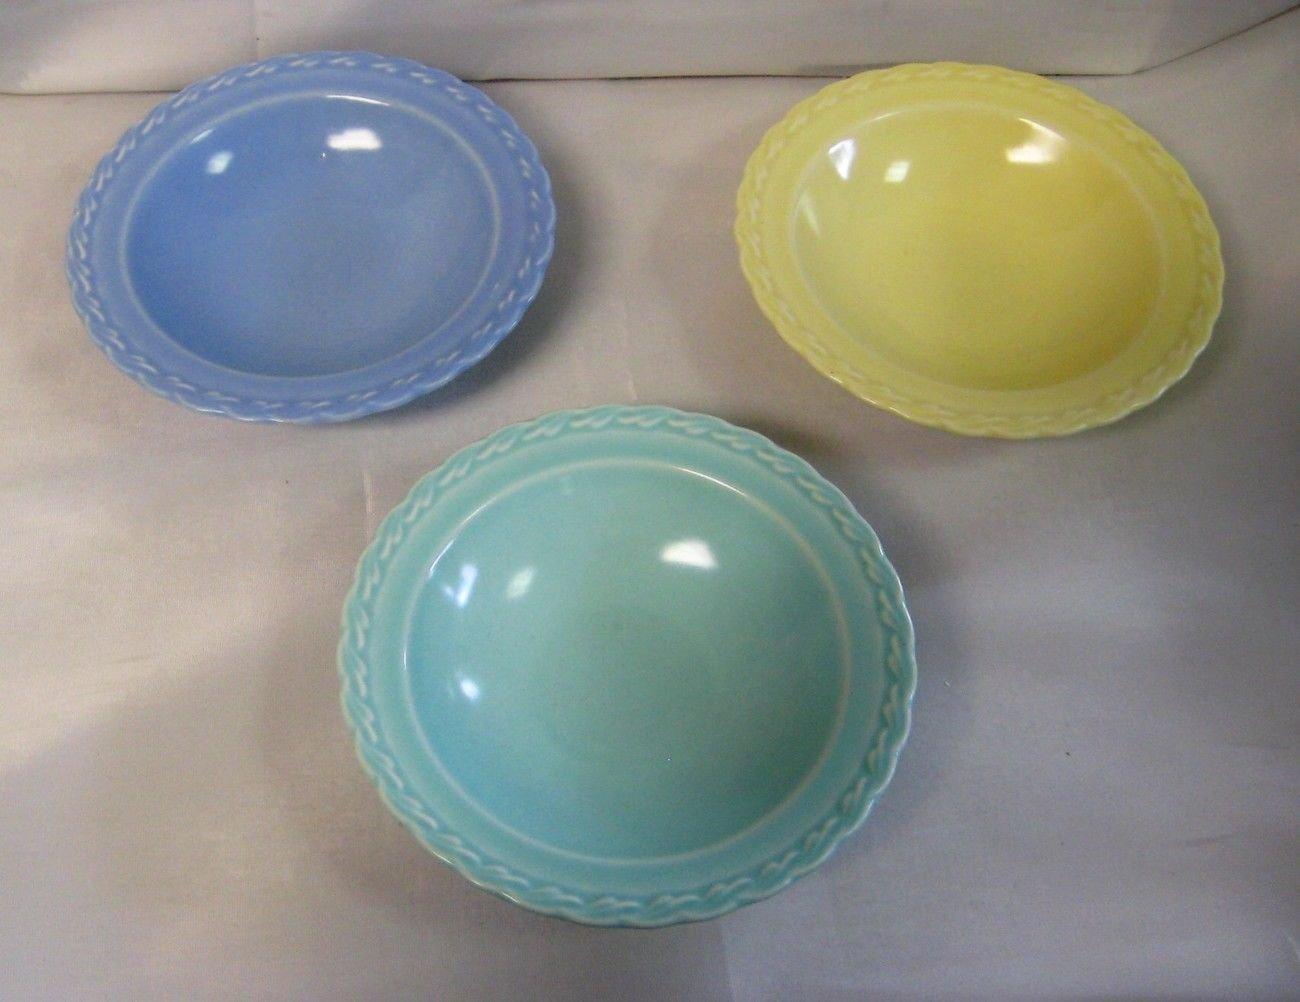 Vernon Kilns Native California Pottery 3 Dessert Bowls Pastel Blue, Green, Yellow